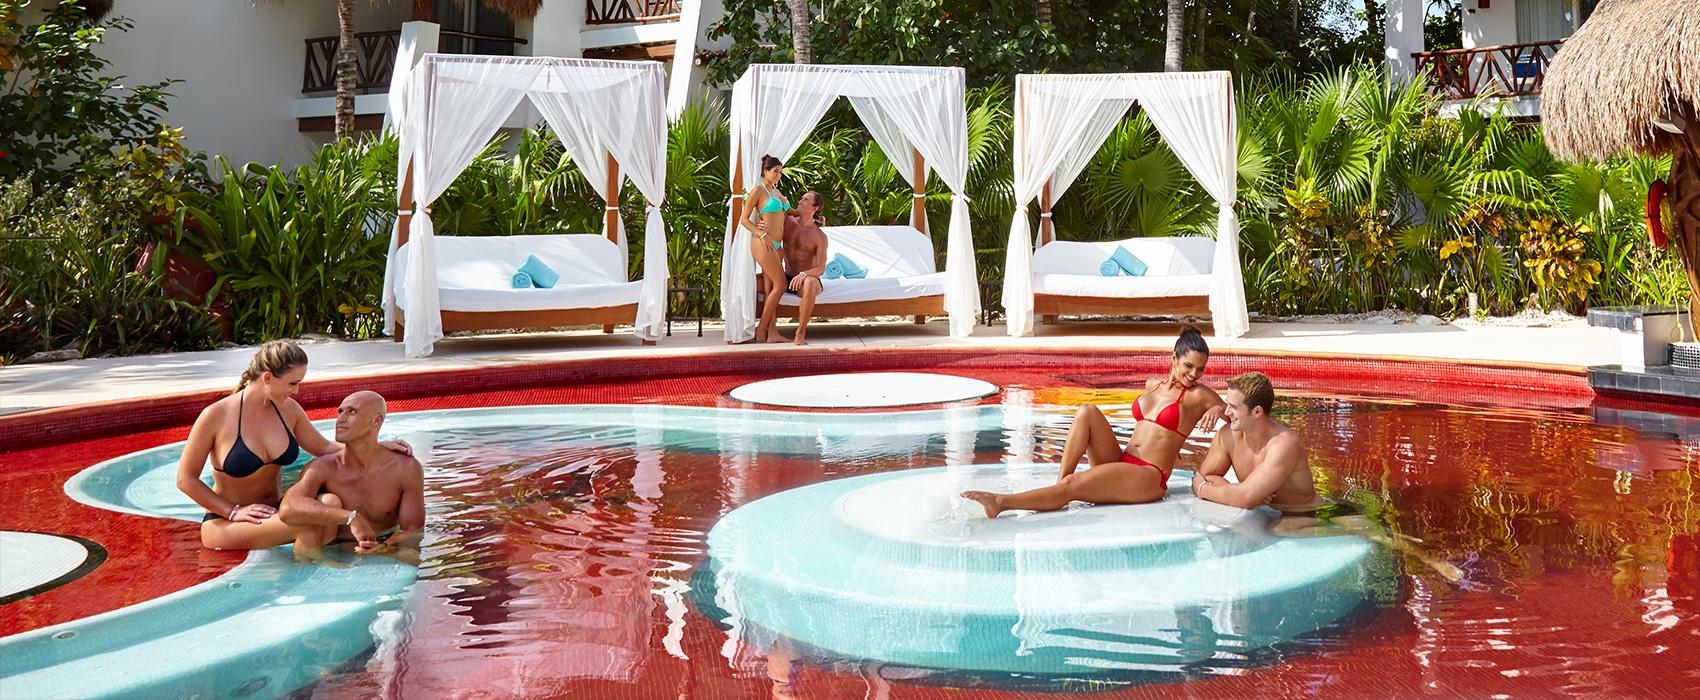 Desire Riviera Maya Pearl Resort Jacuzzi Lounge